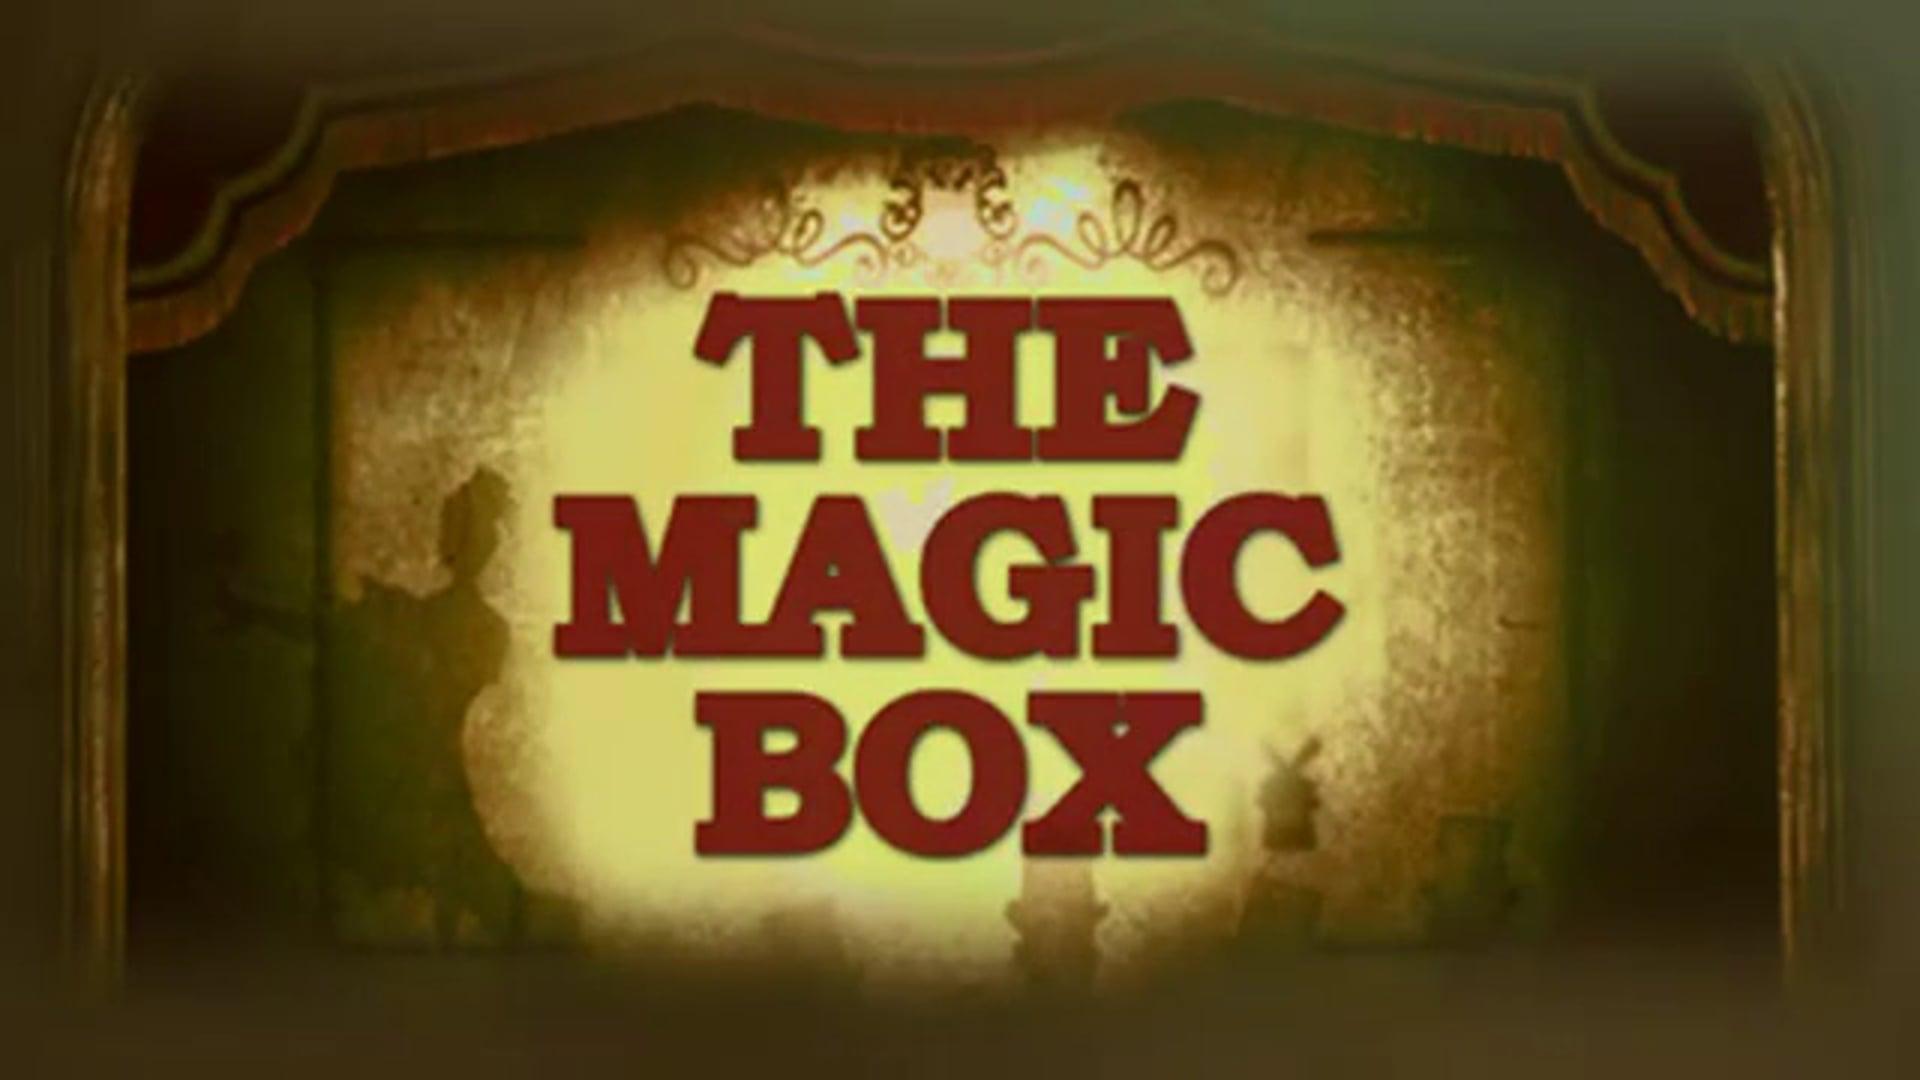 Magic Box For Children's Hospital of Orange County